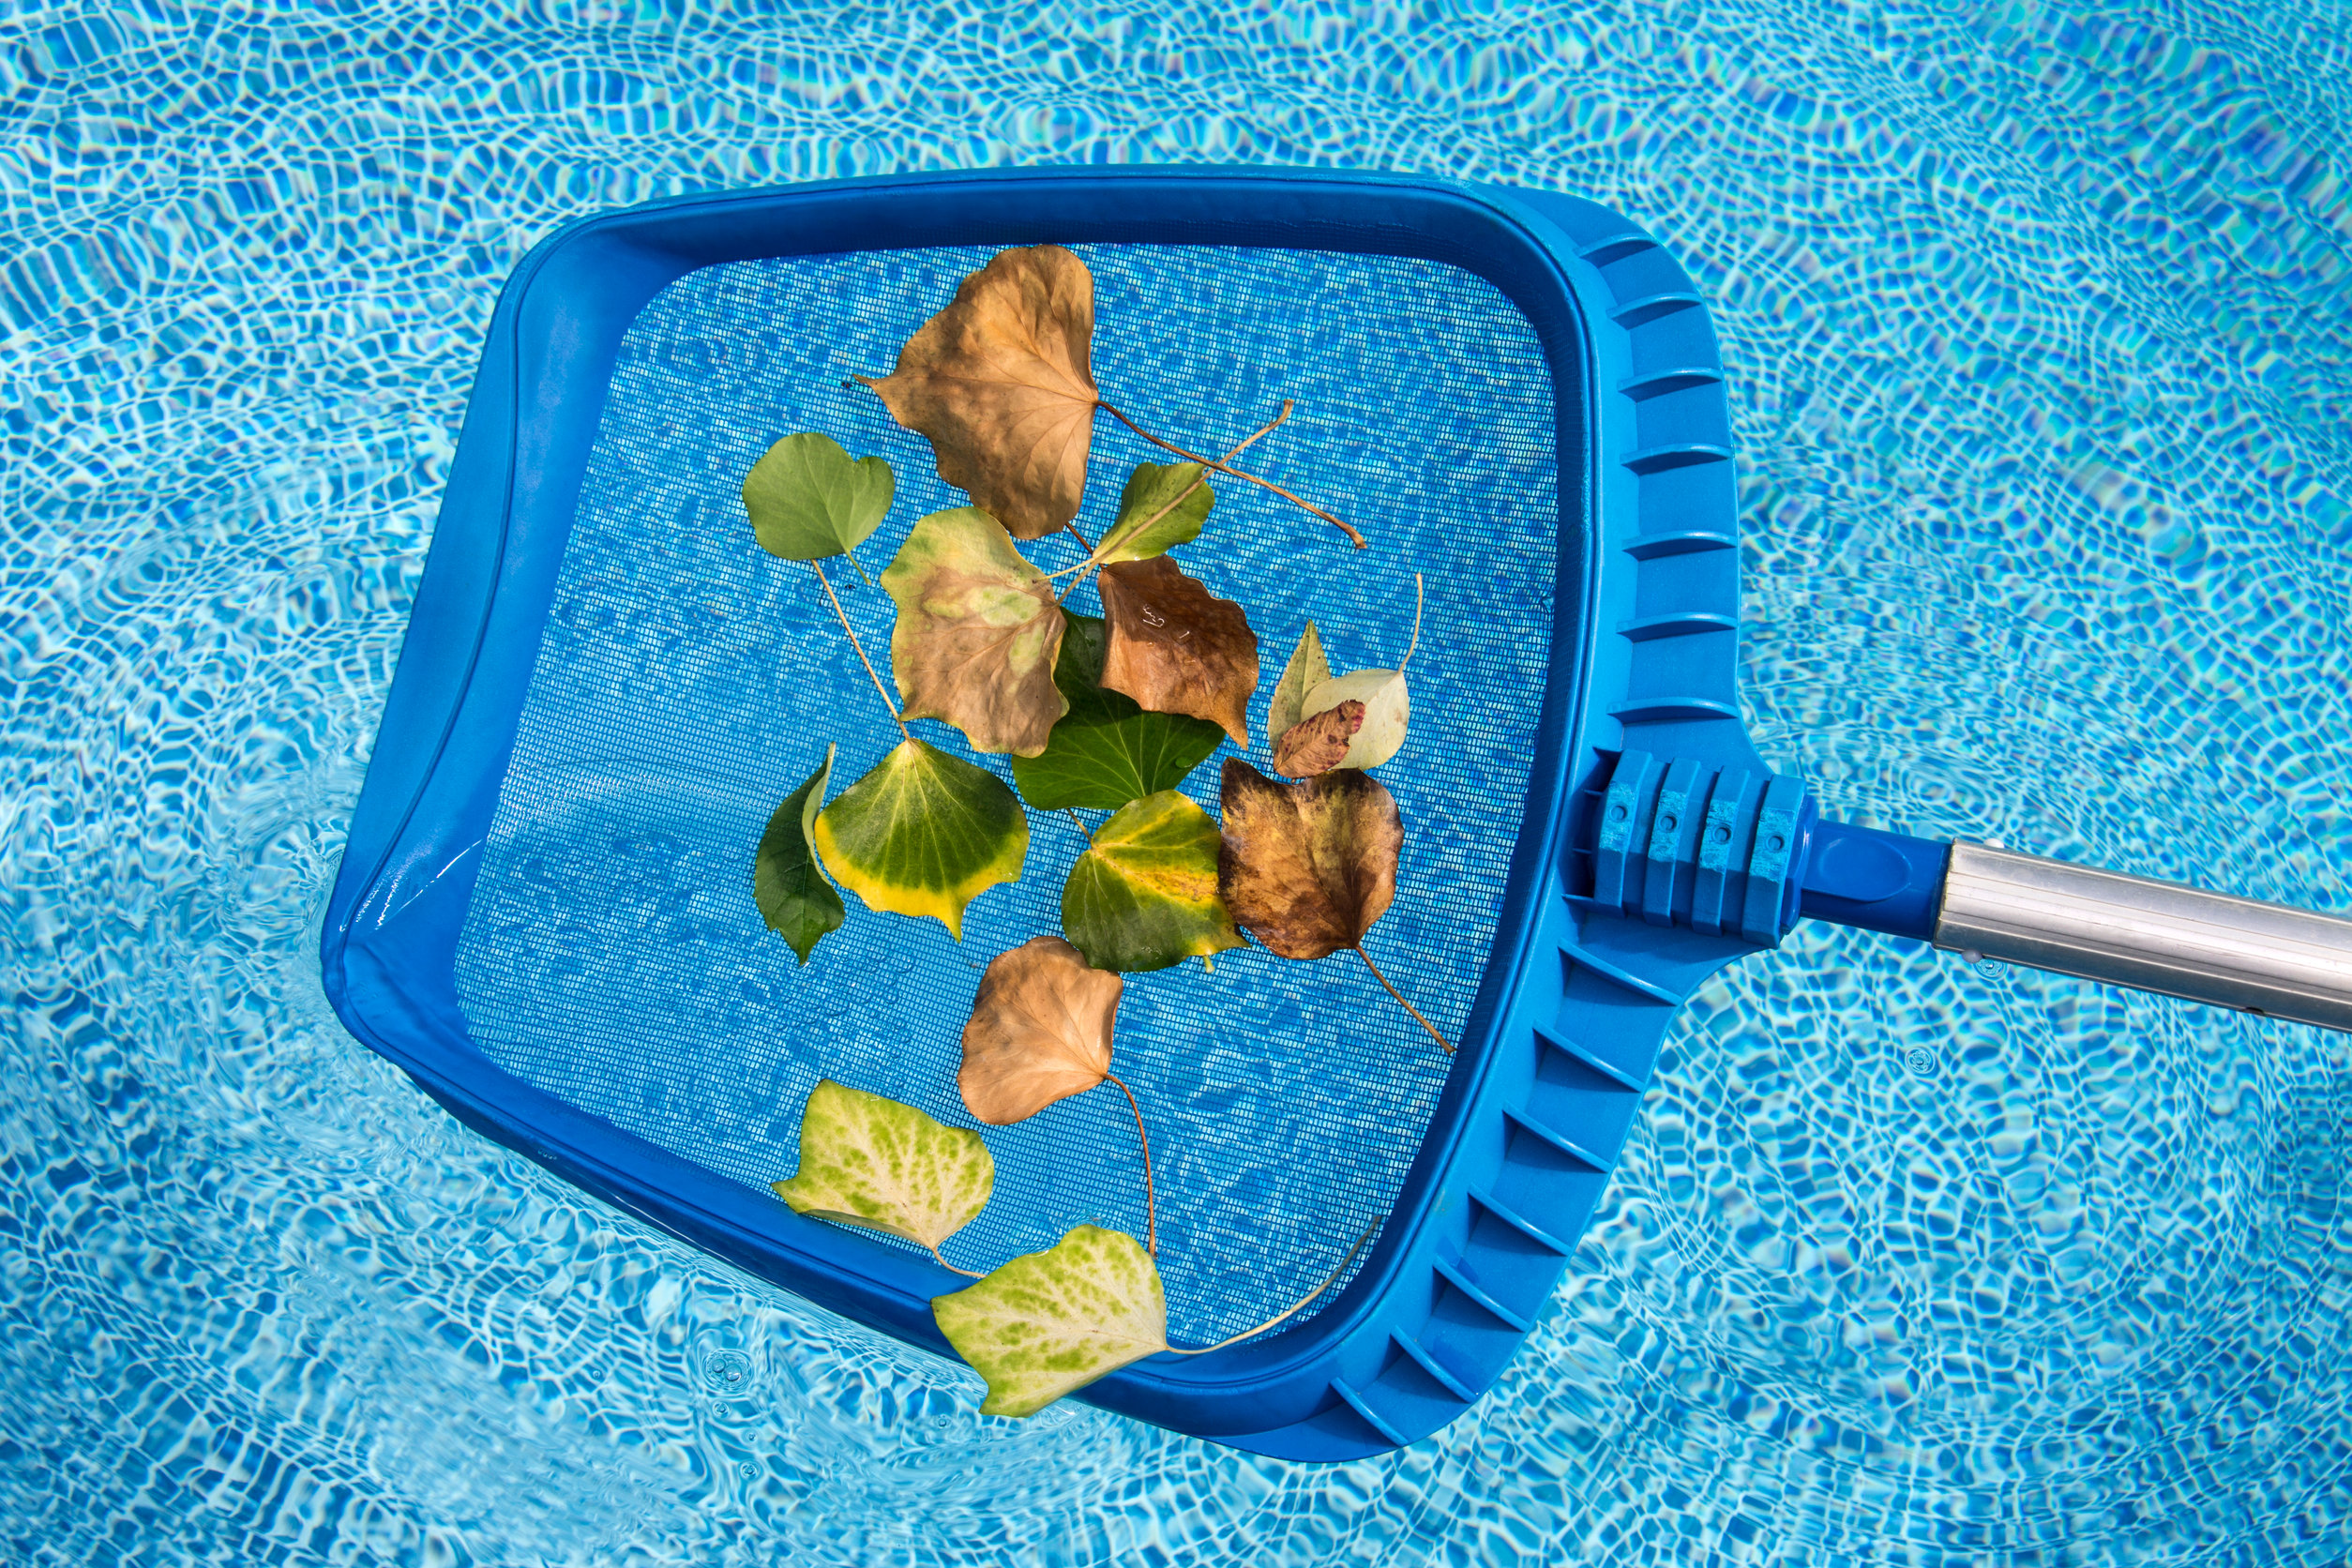 pool leaf skimmer